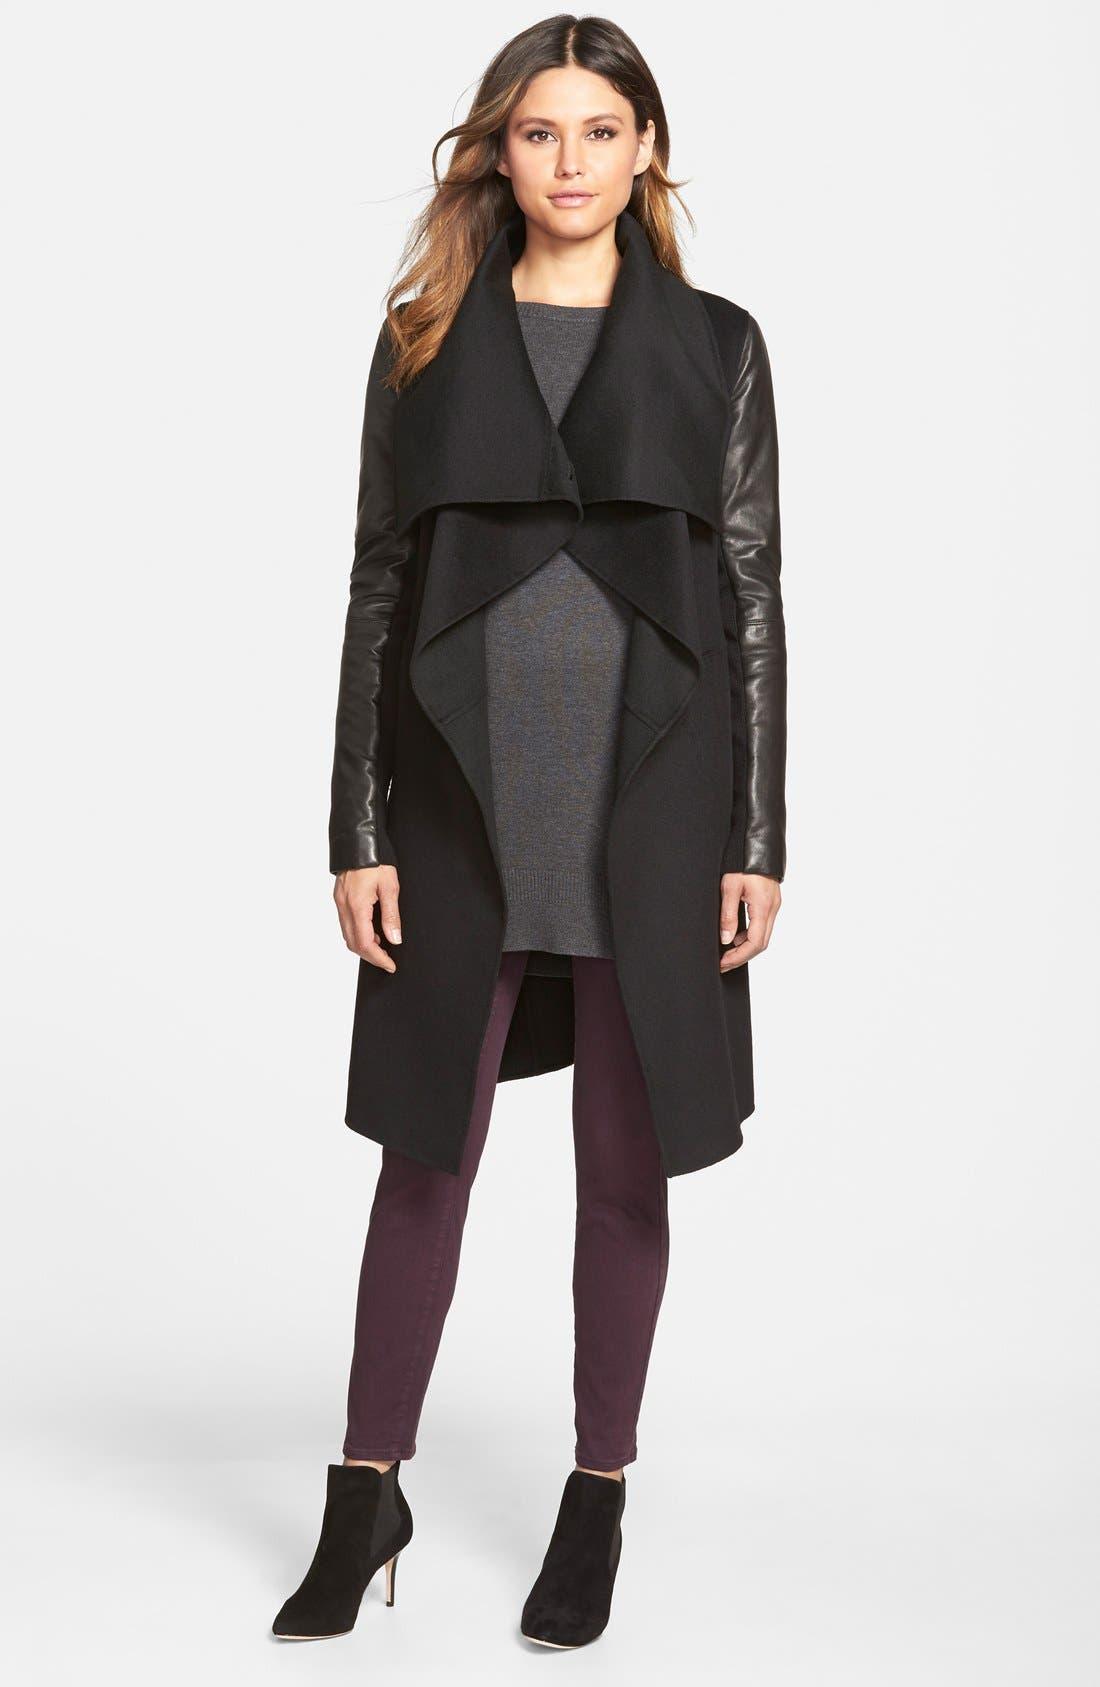 Alternate Image 1 Selected - Mackage Wool Blend Coat with Leather Sleeves